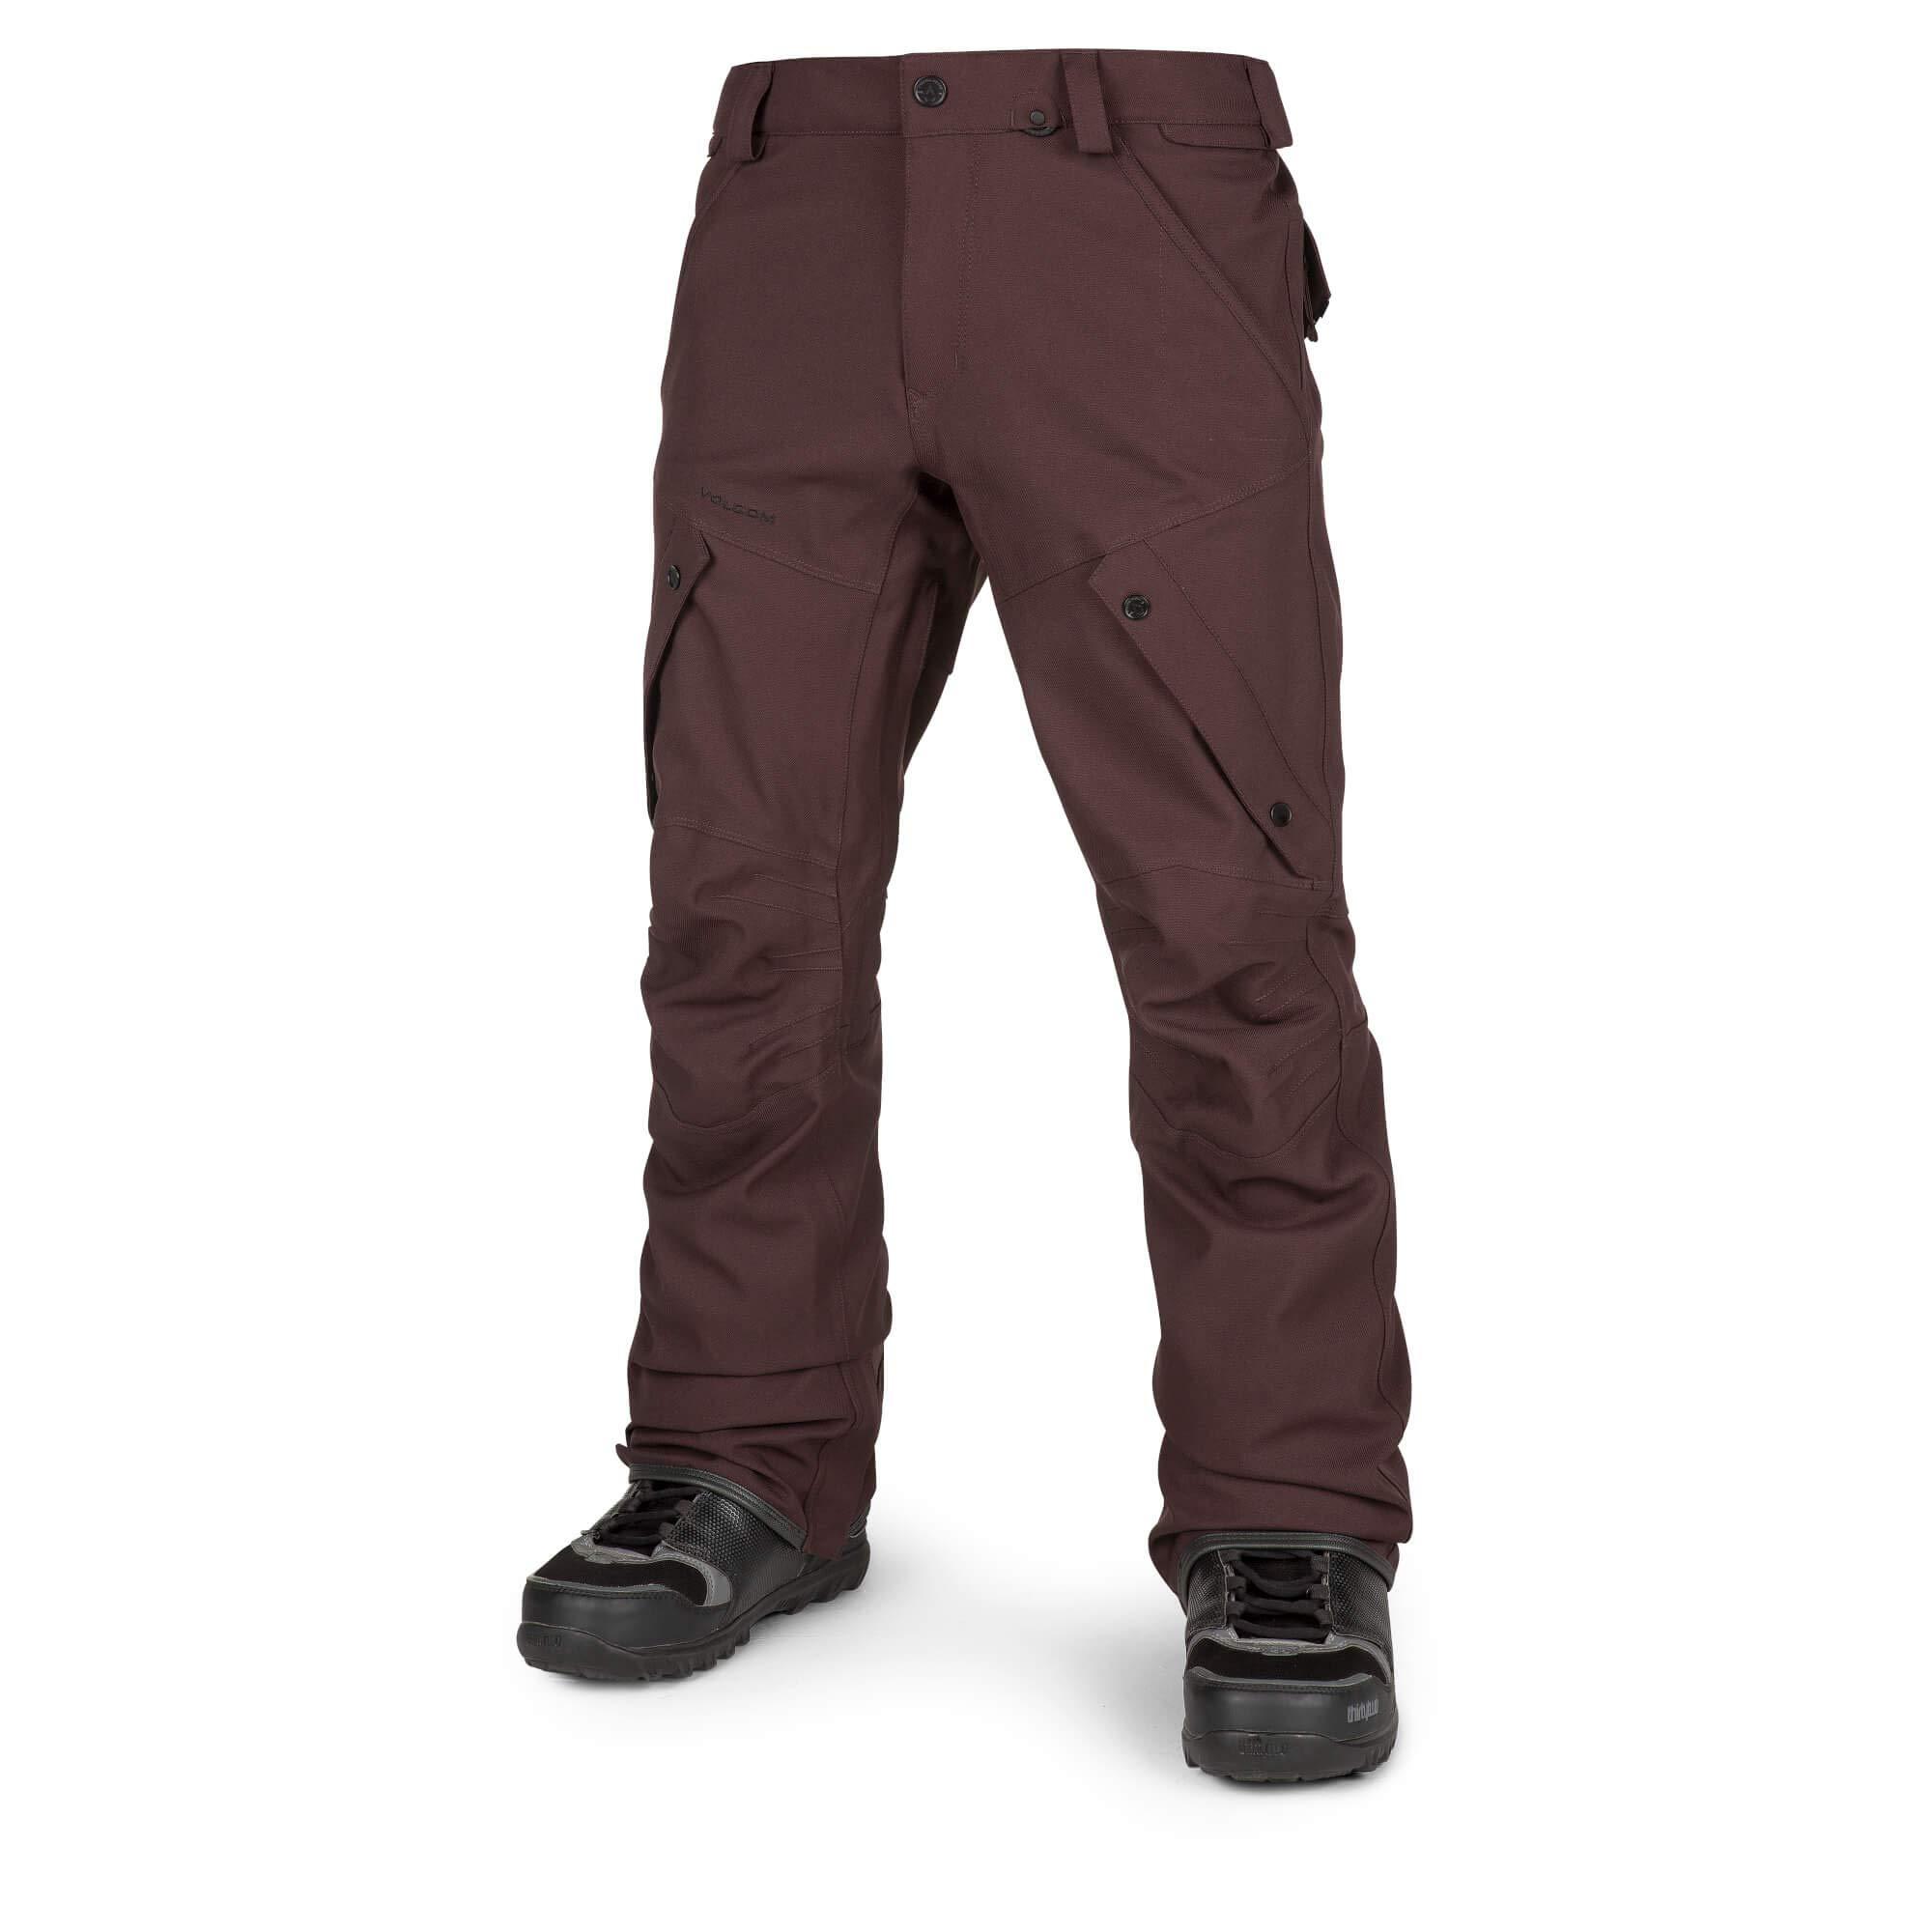 Volcom Men's Articulated Modern Fit Snow Pants, Black/red, Medium